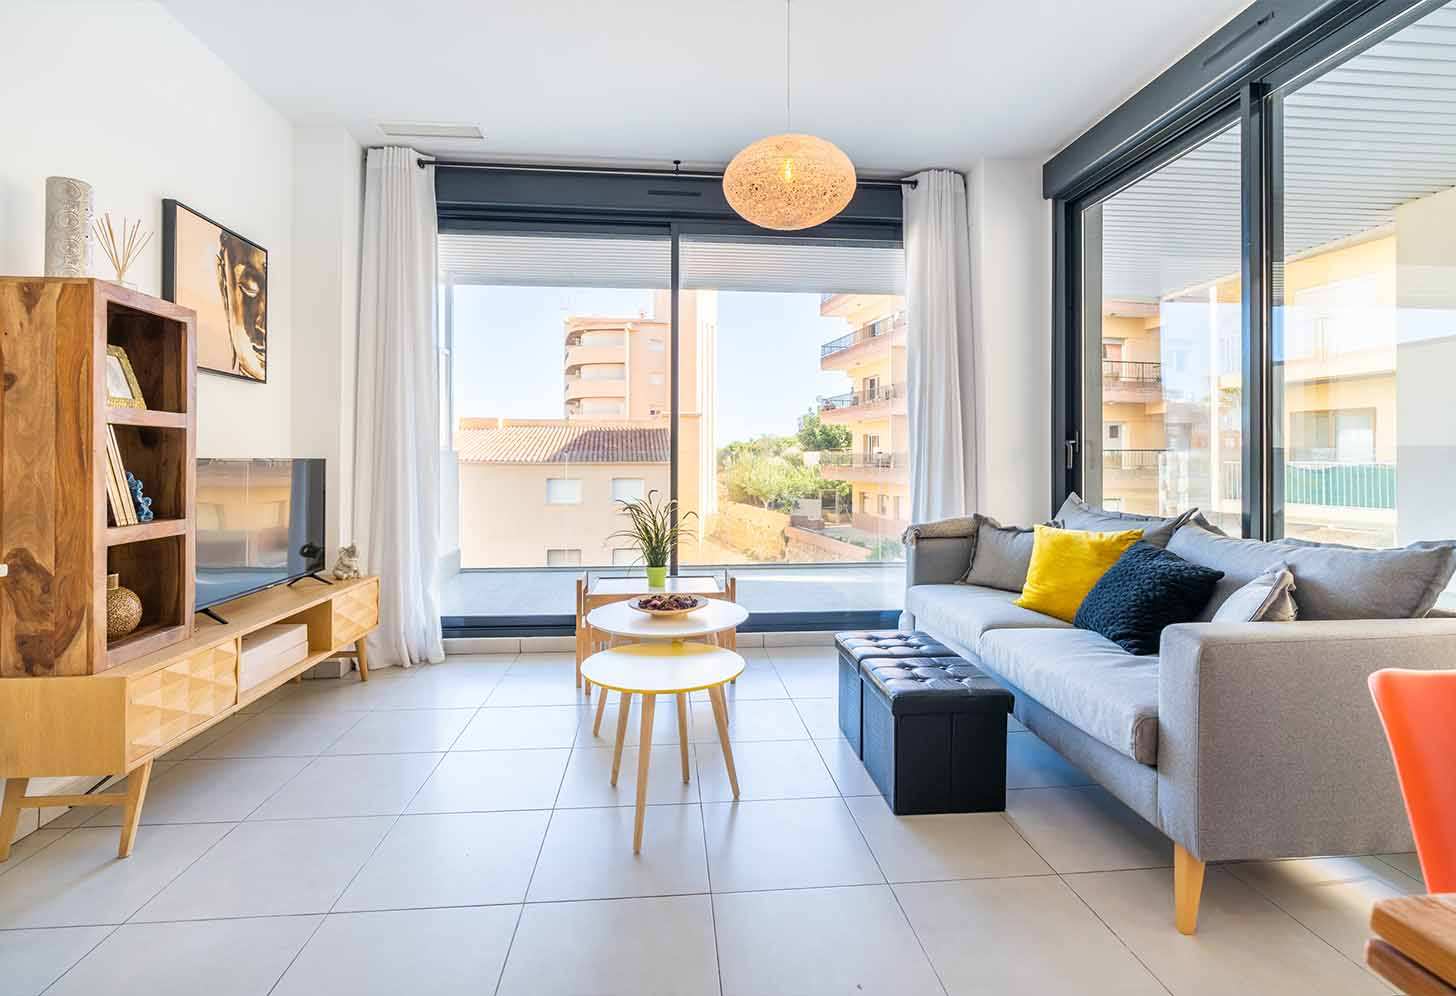 immobilier neuf espagne costa blanca on-m1 calpe beach II salon